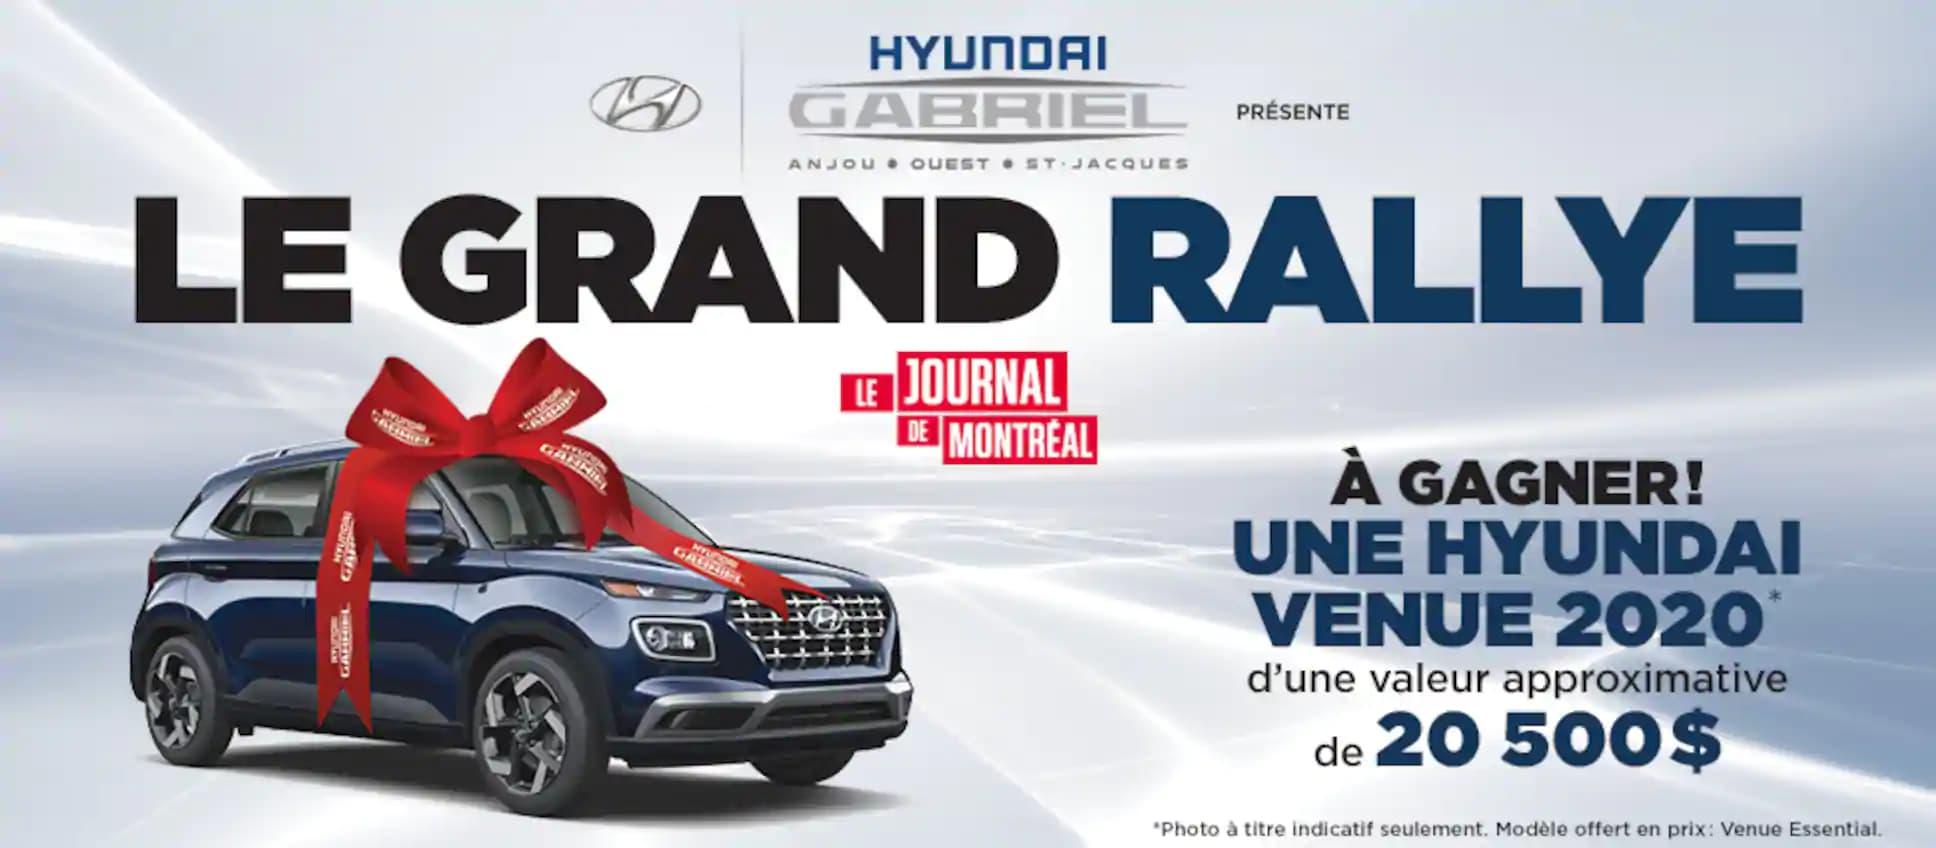 Concours Journal de Montréal Le Grand Rallye 2020 ...